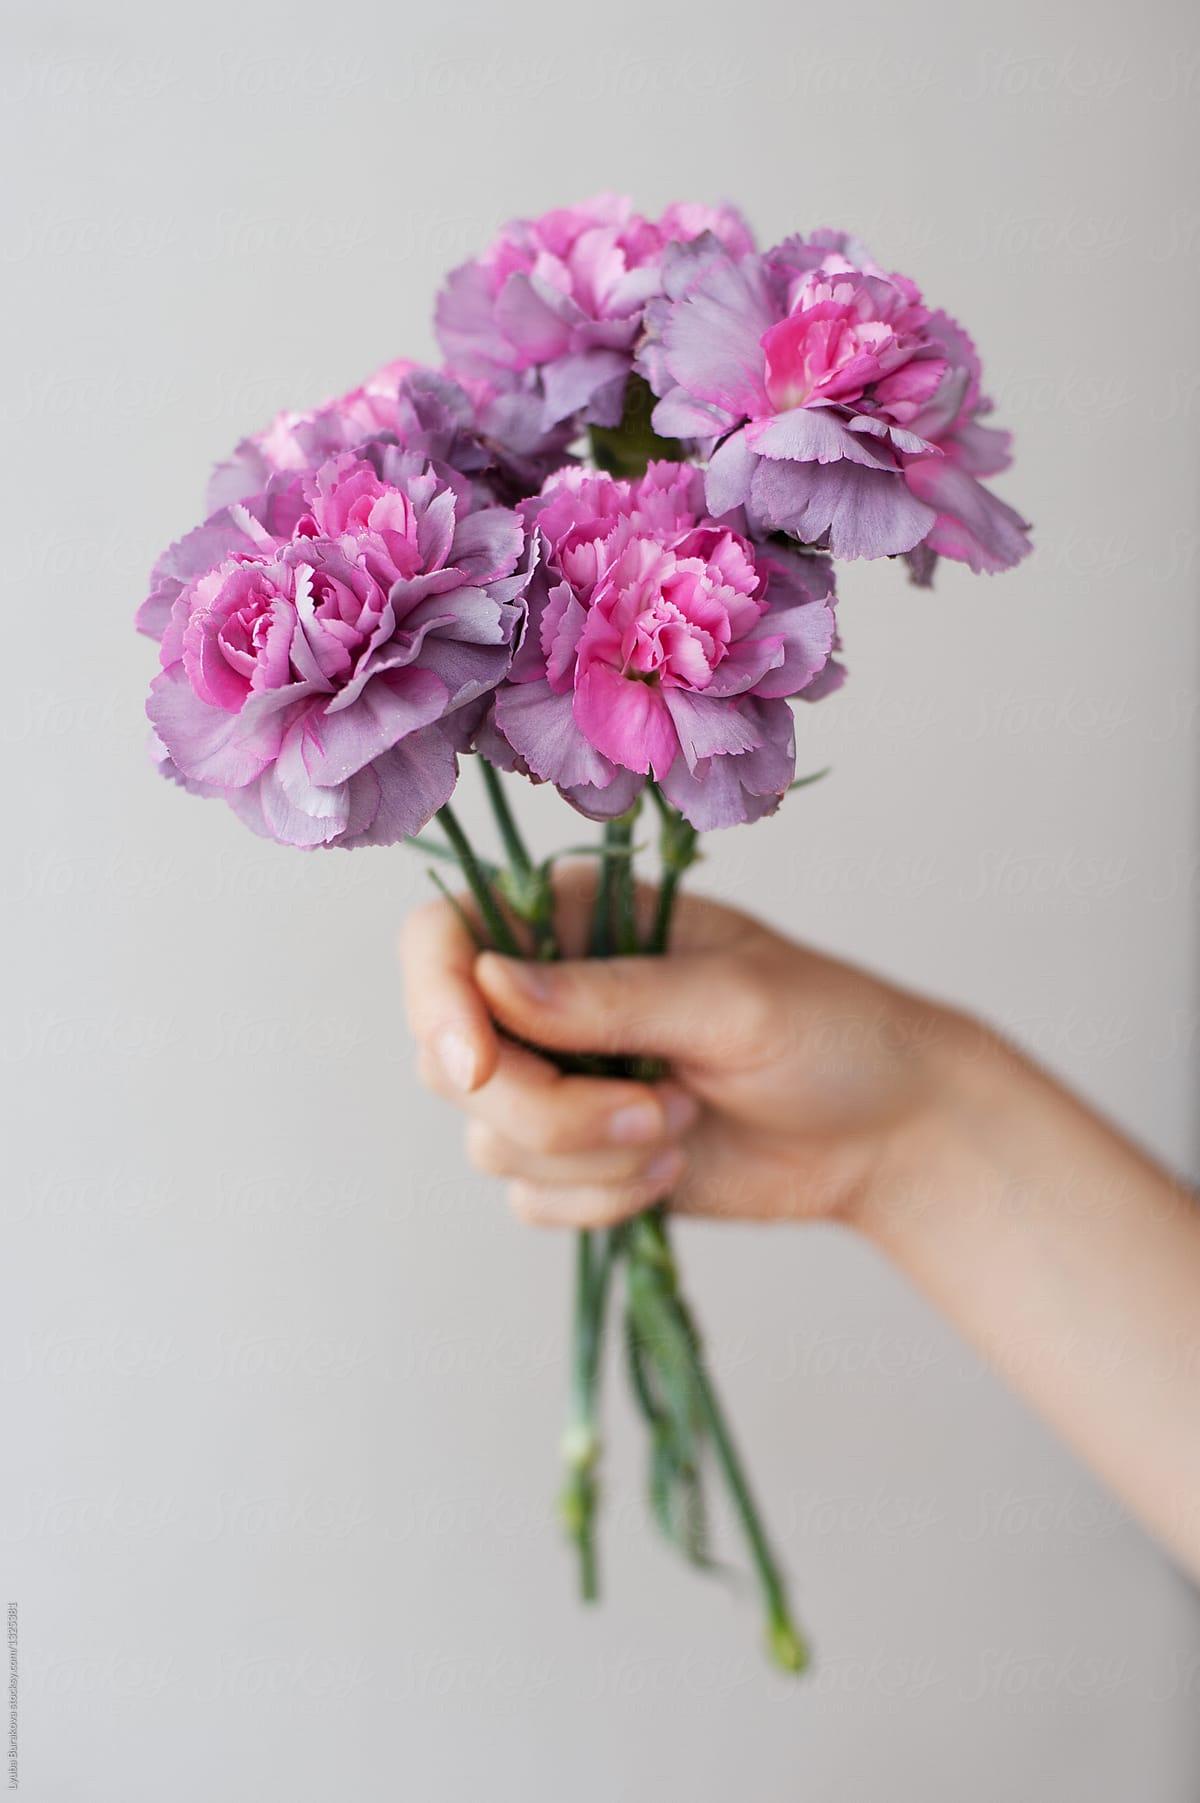 Woman holding bunch of pink flowers stocksy united woman holding bunch of pink flowers by lyuba burakova for stocksy united mightylinksfo